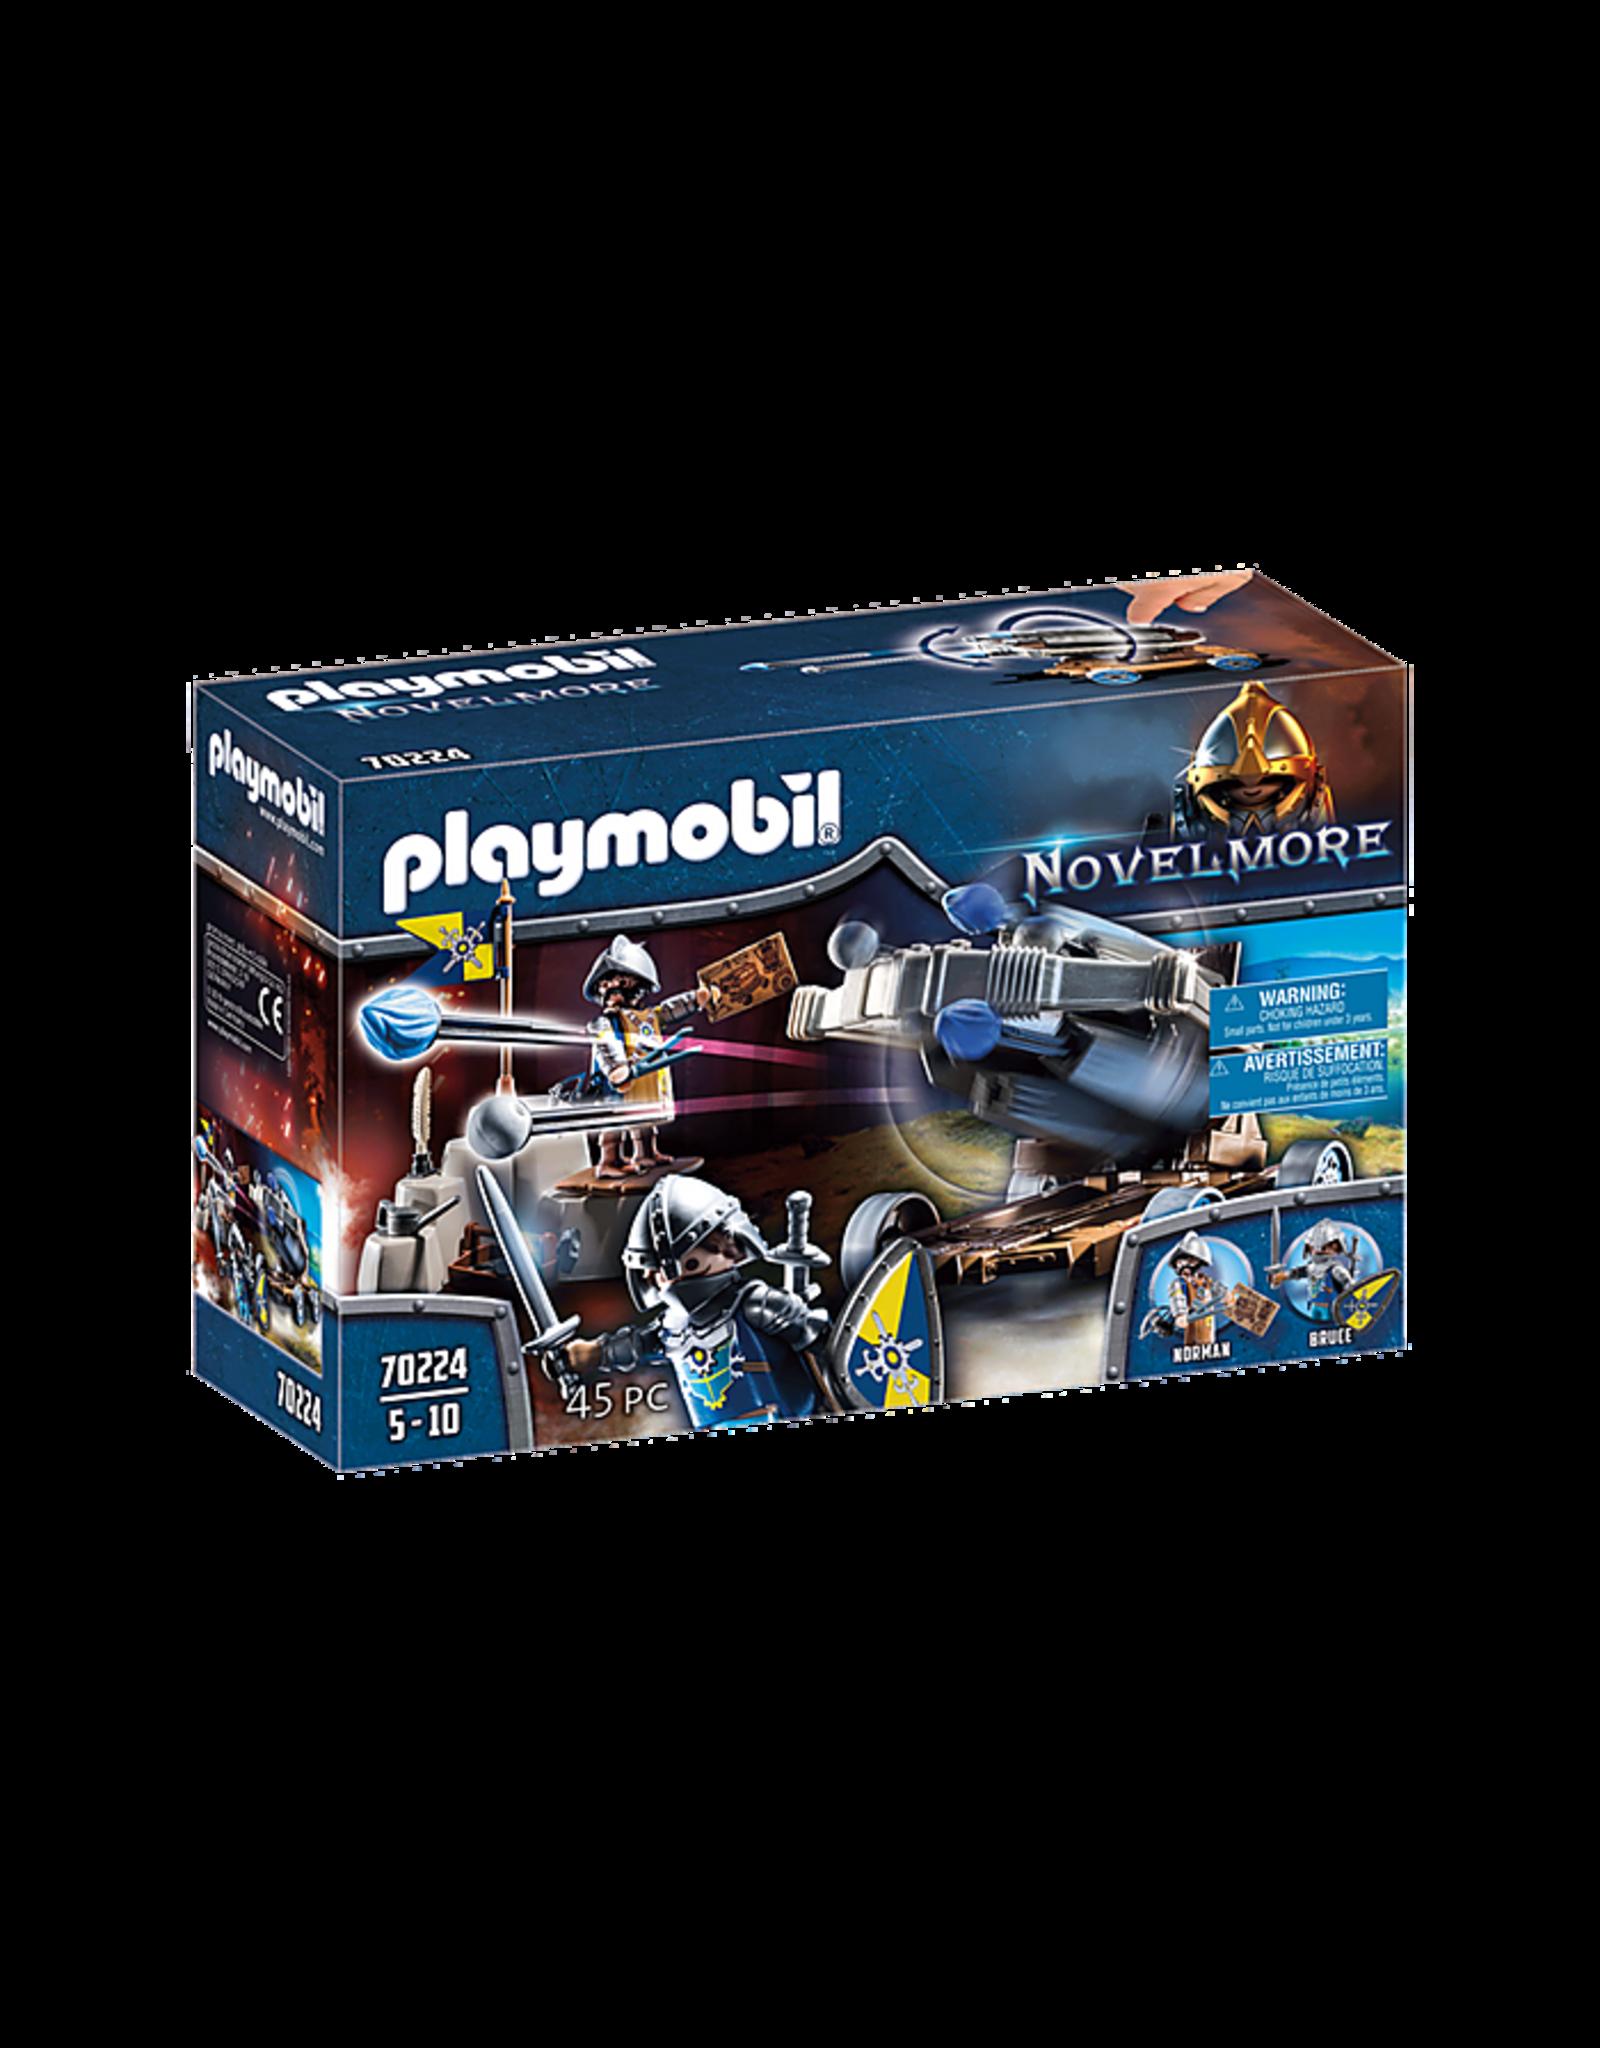 Playmobil Novelmore Water Ballista